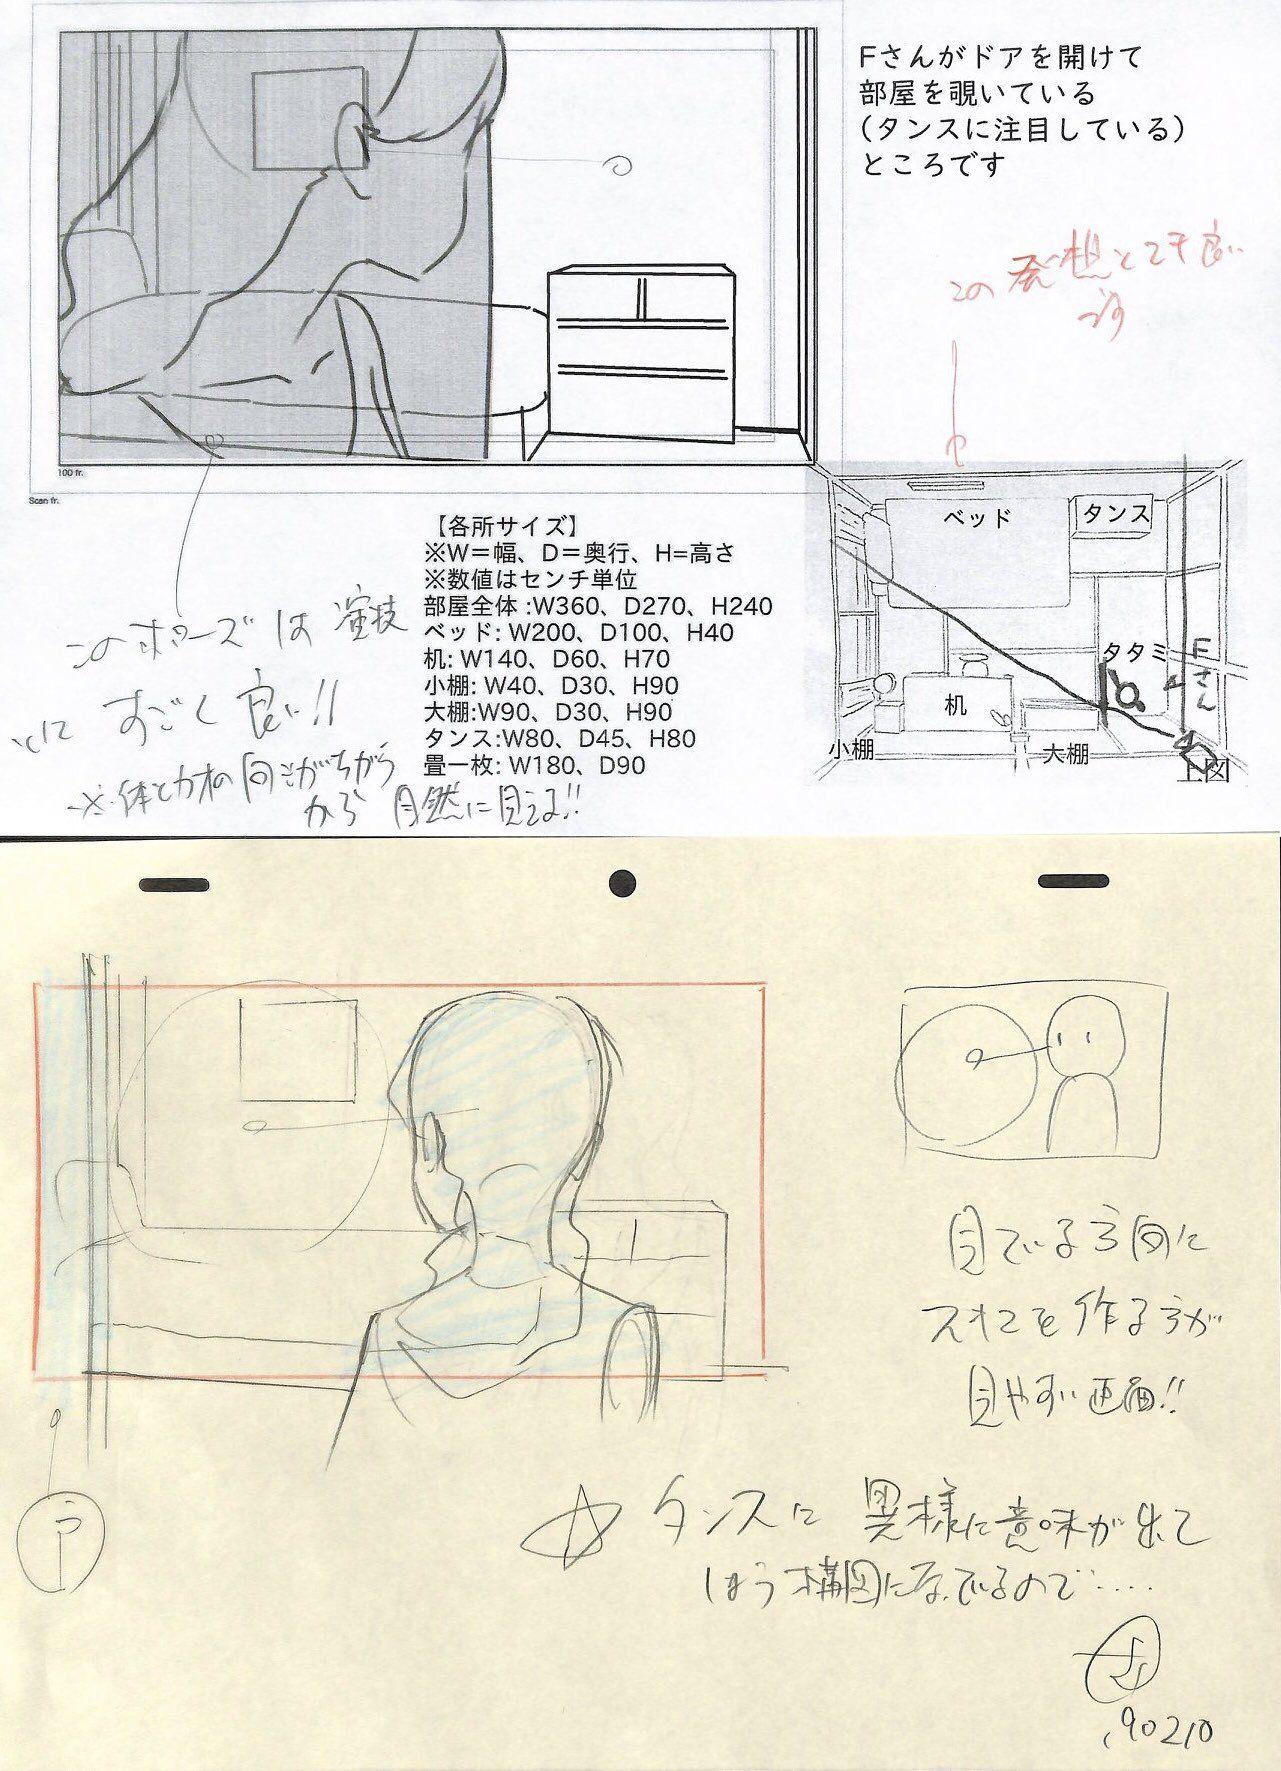 Twitter 漫画イラスト アニメ 描き方